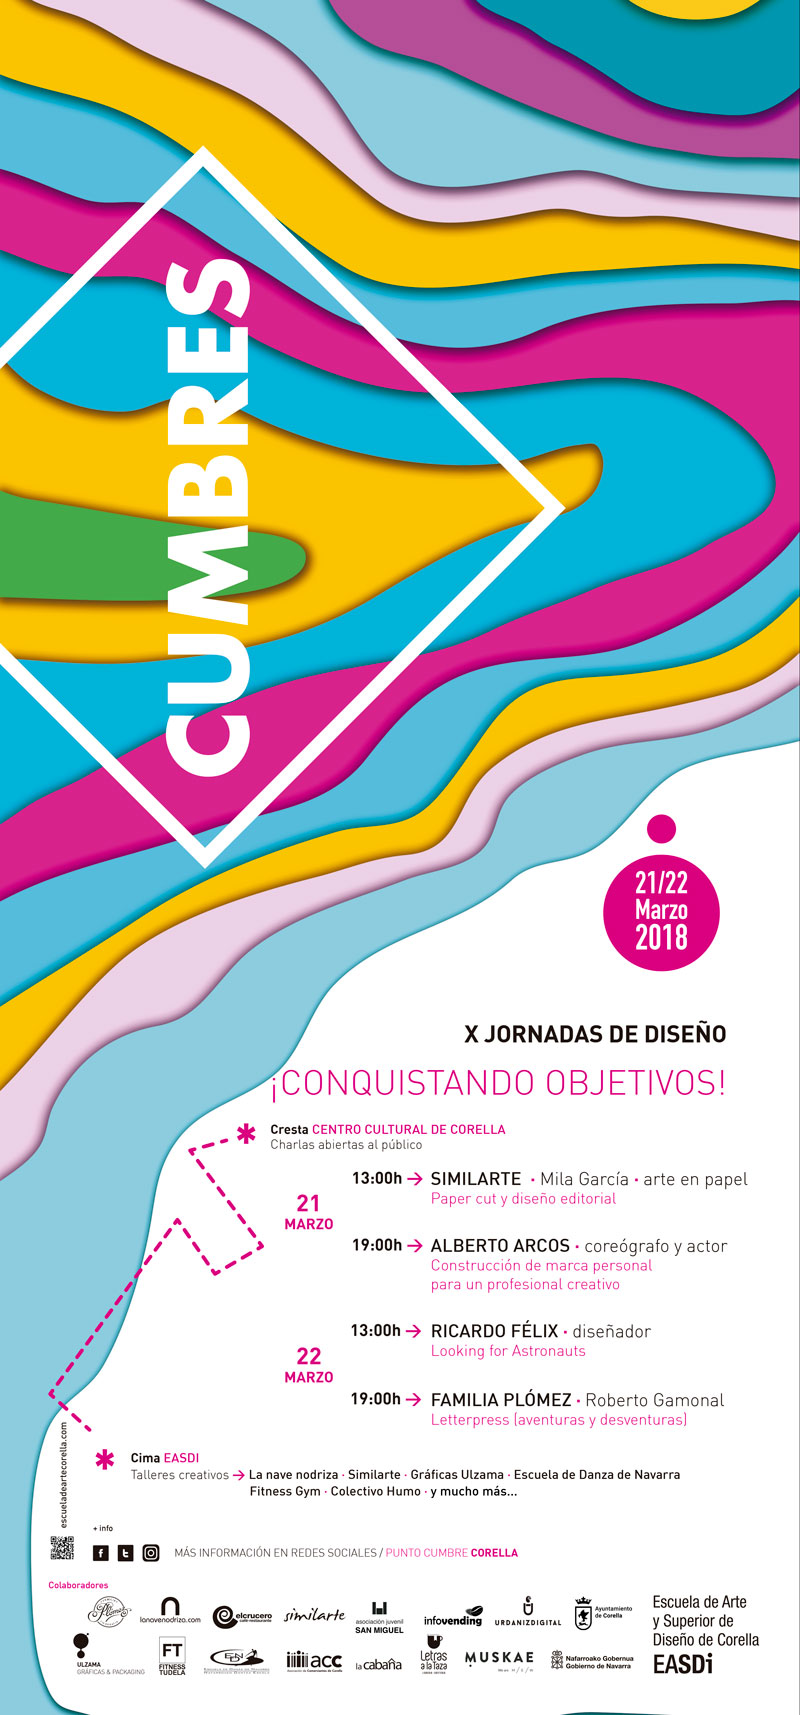 cartel del encuentro CUMBRES